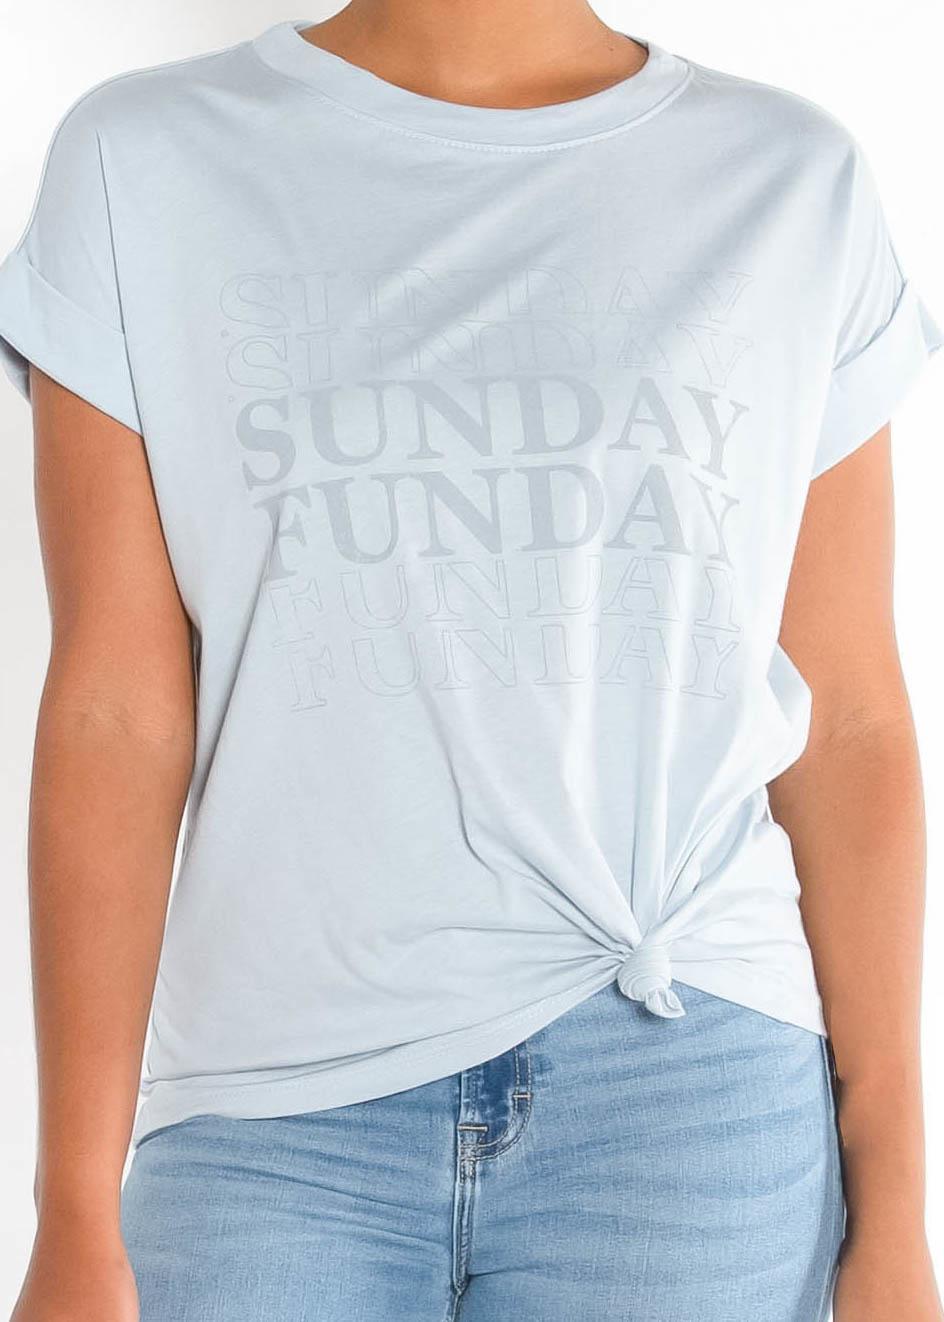 SUNDAY FUNDAY GRAPHIC TEE